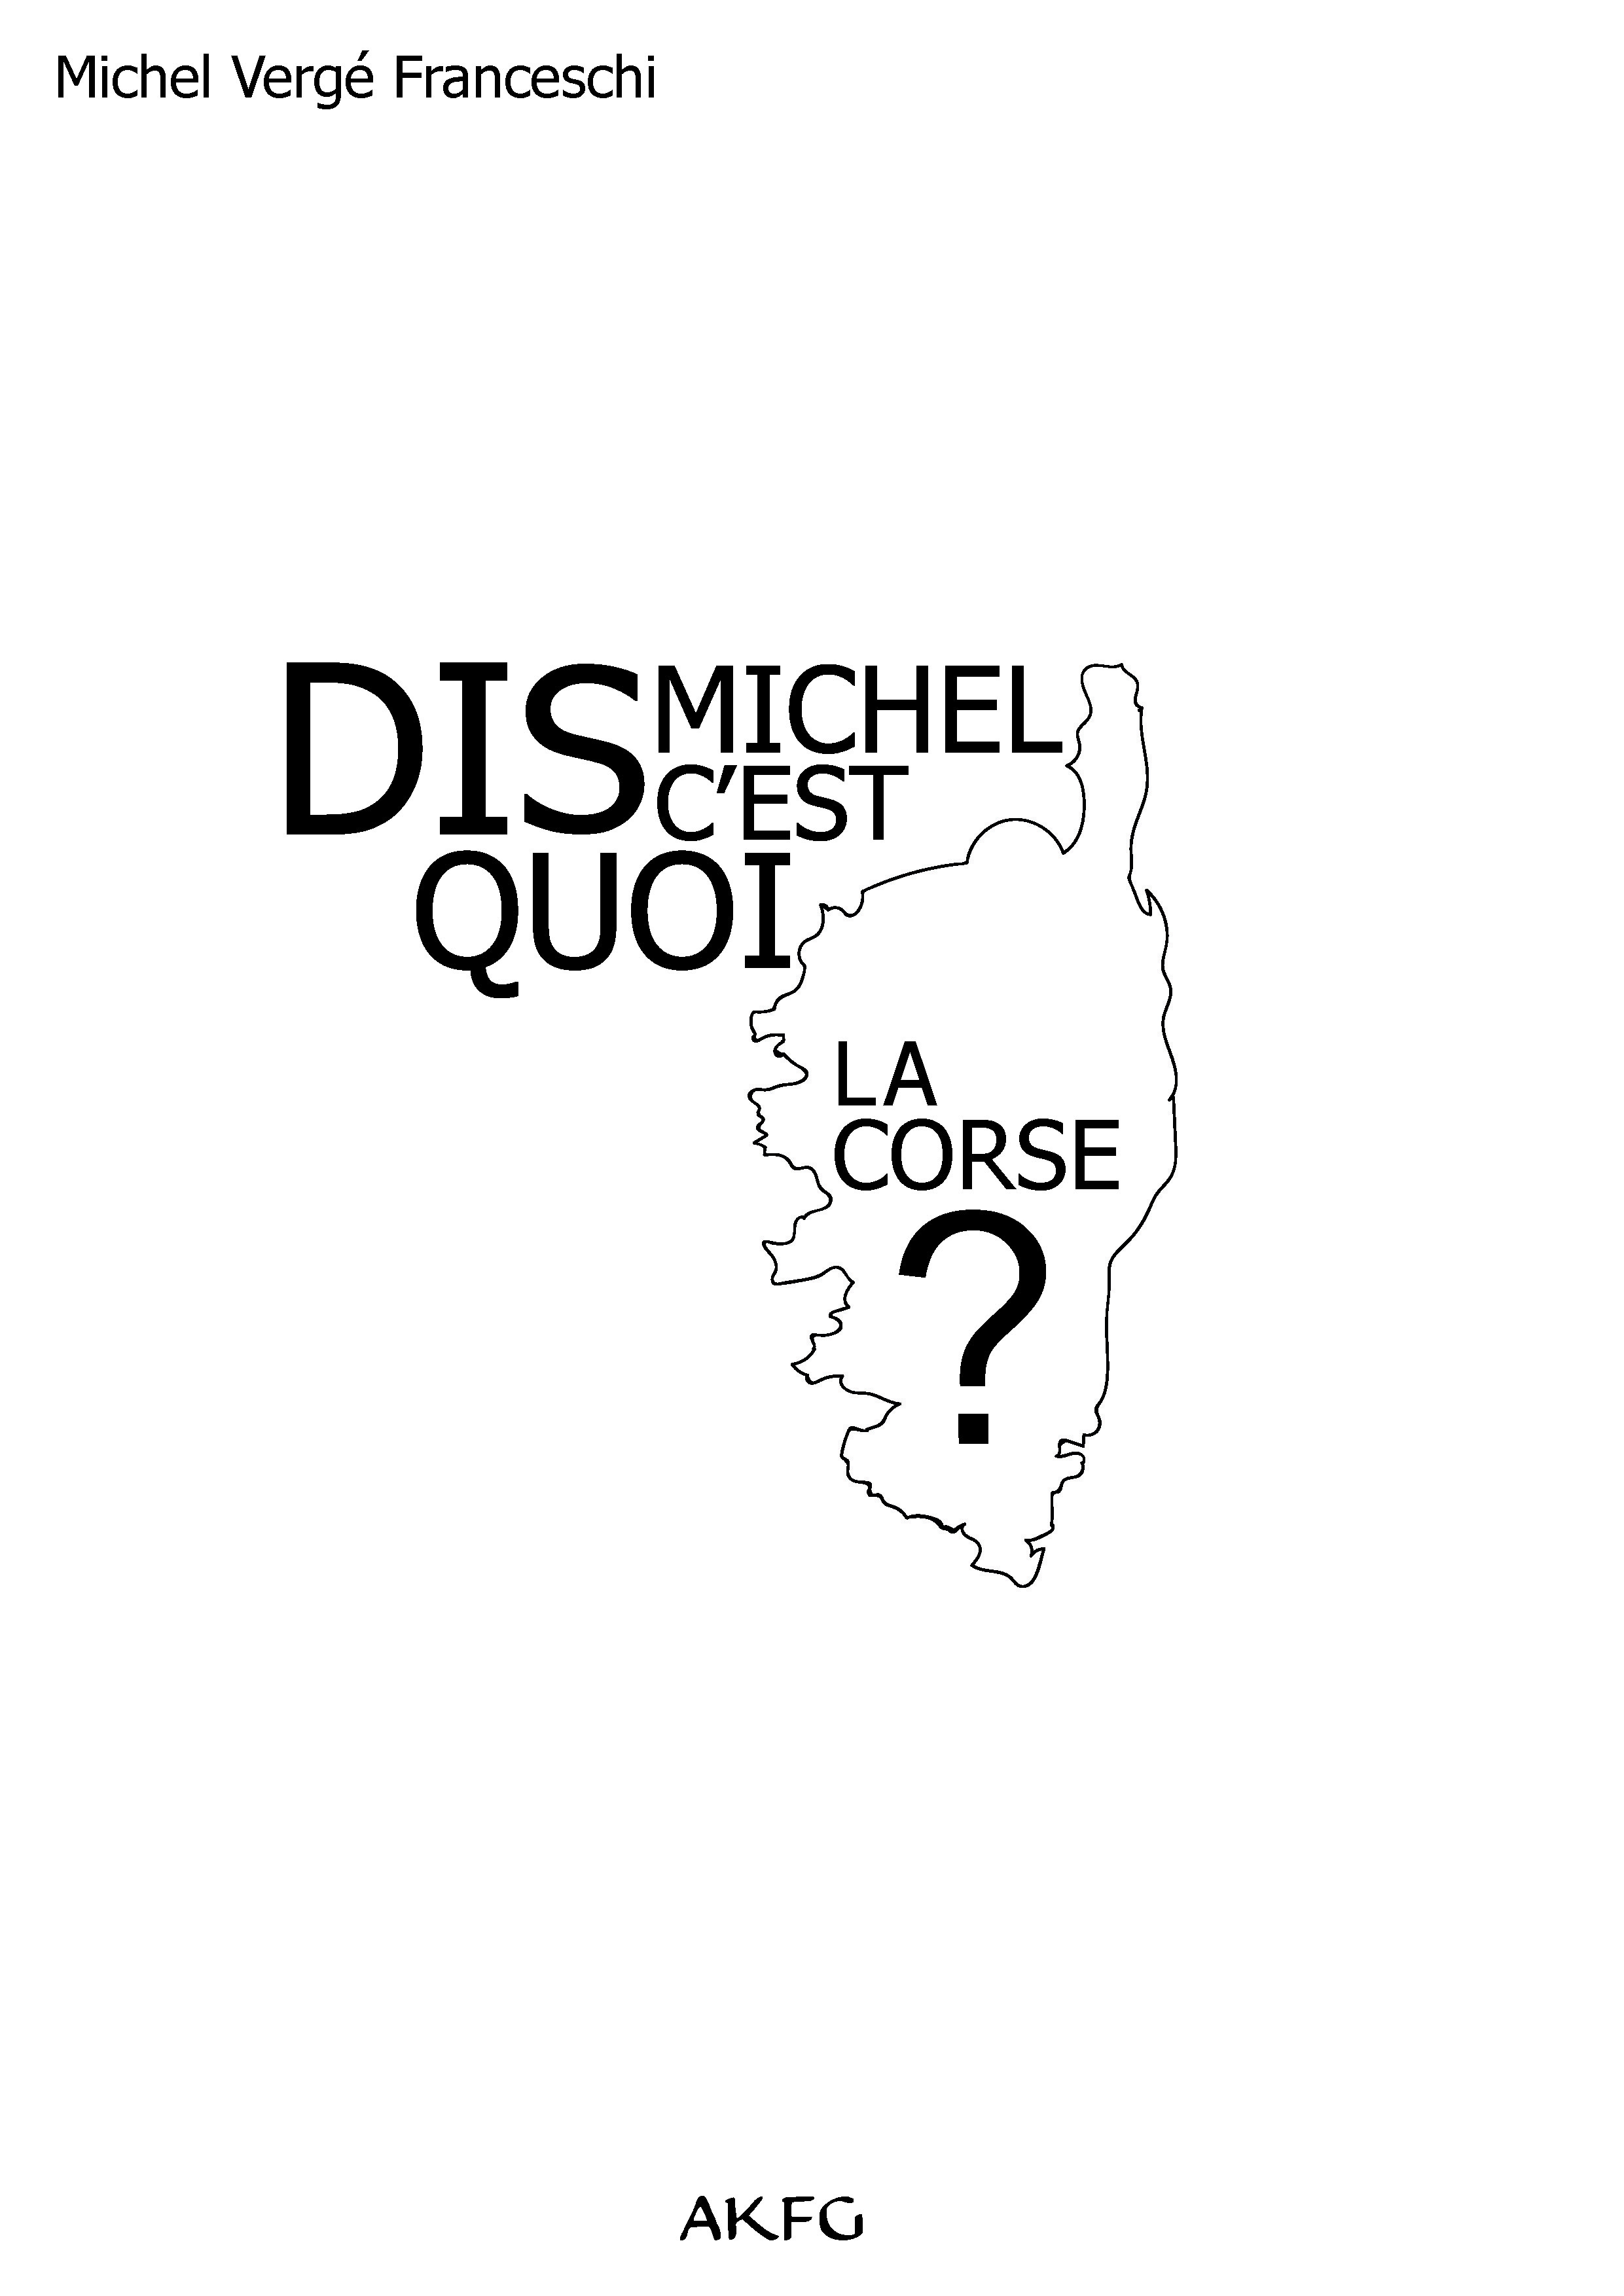 DIS MICHEL, C EST QUOI LA CORSE ?